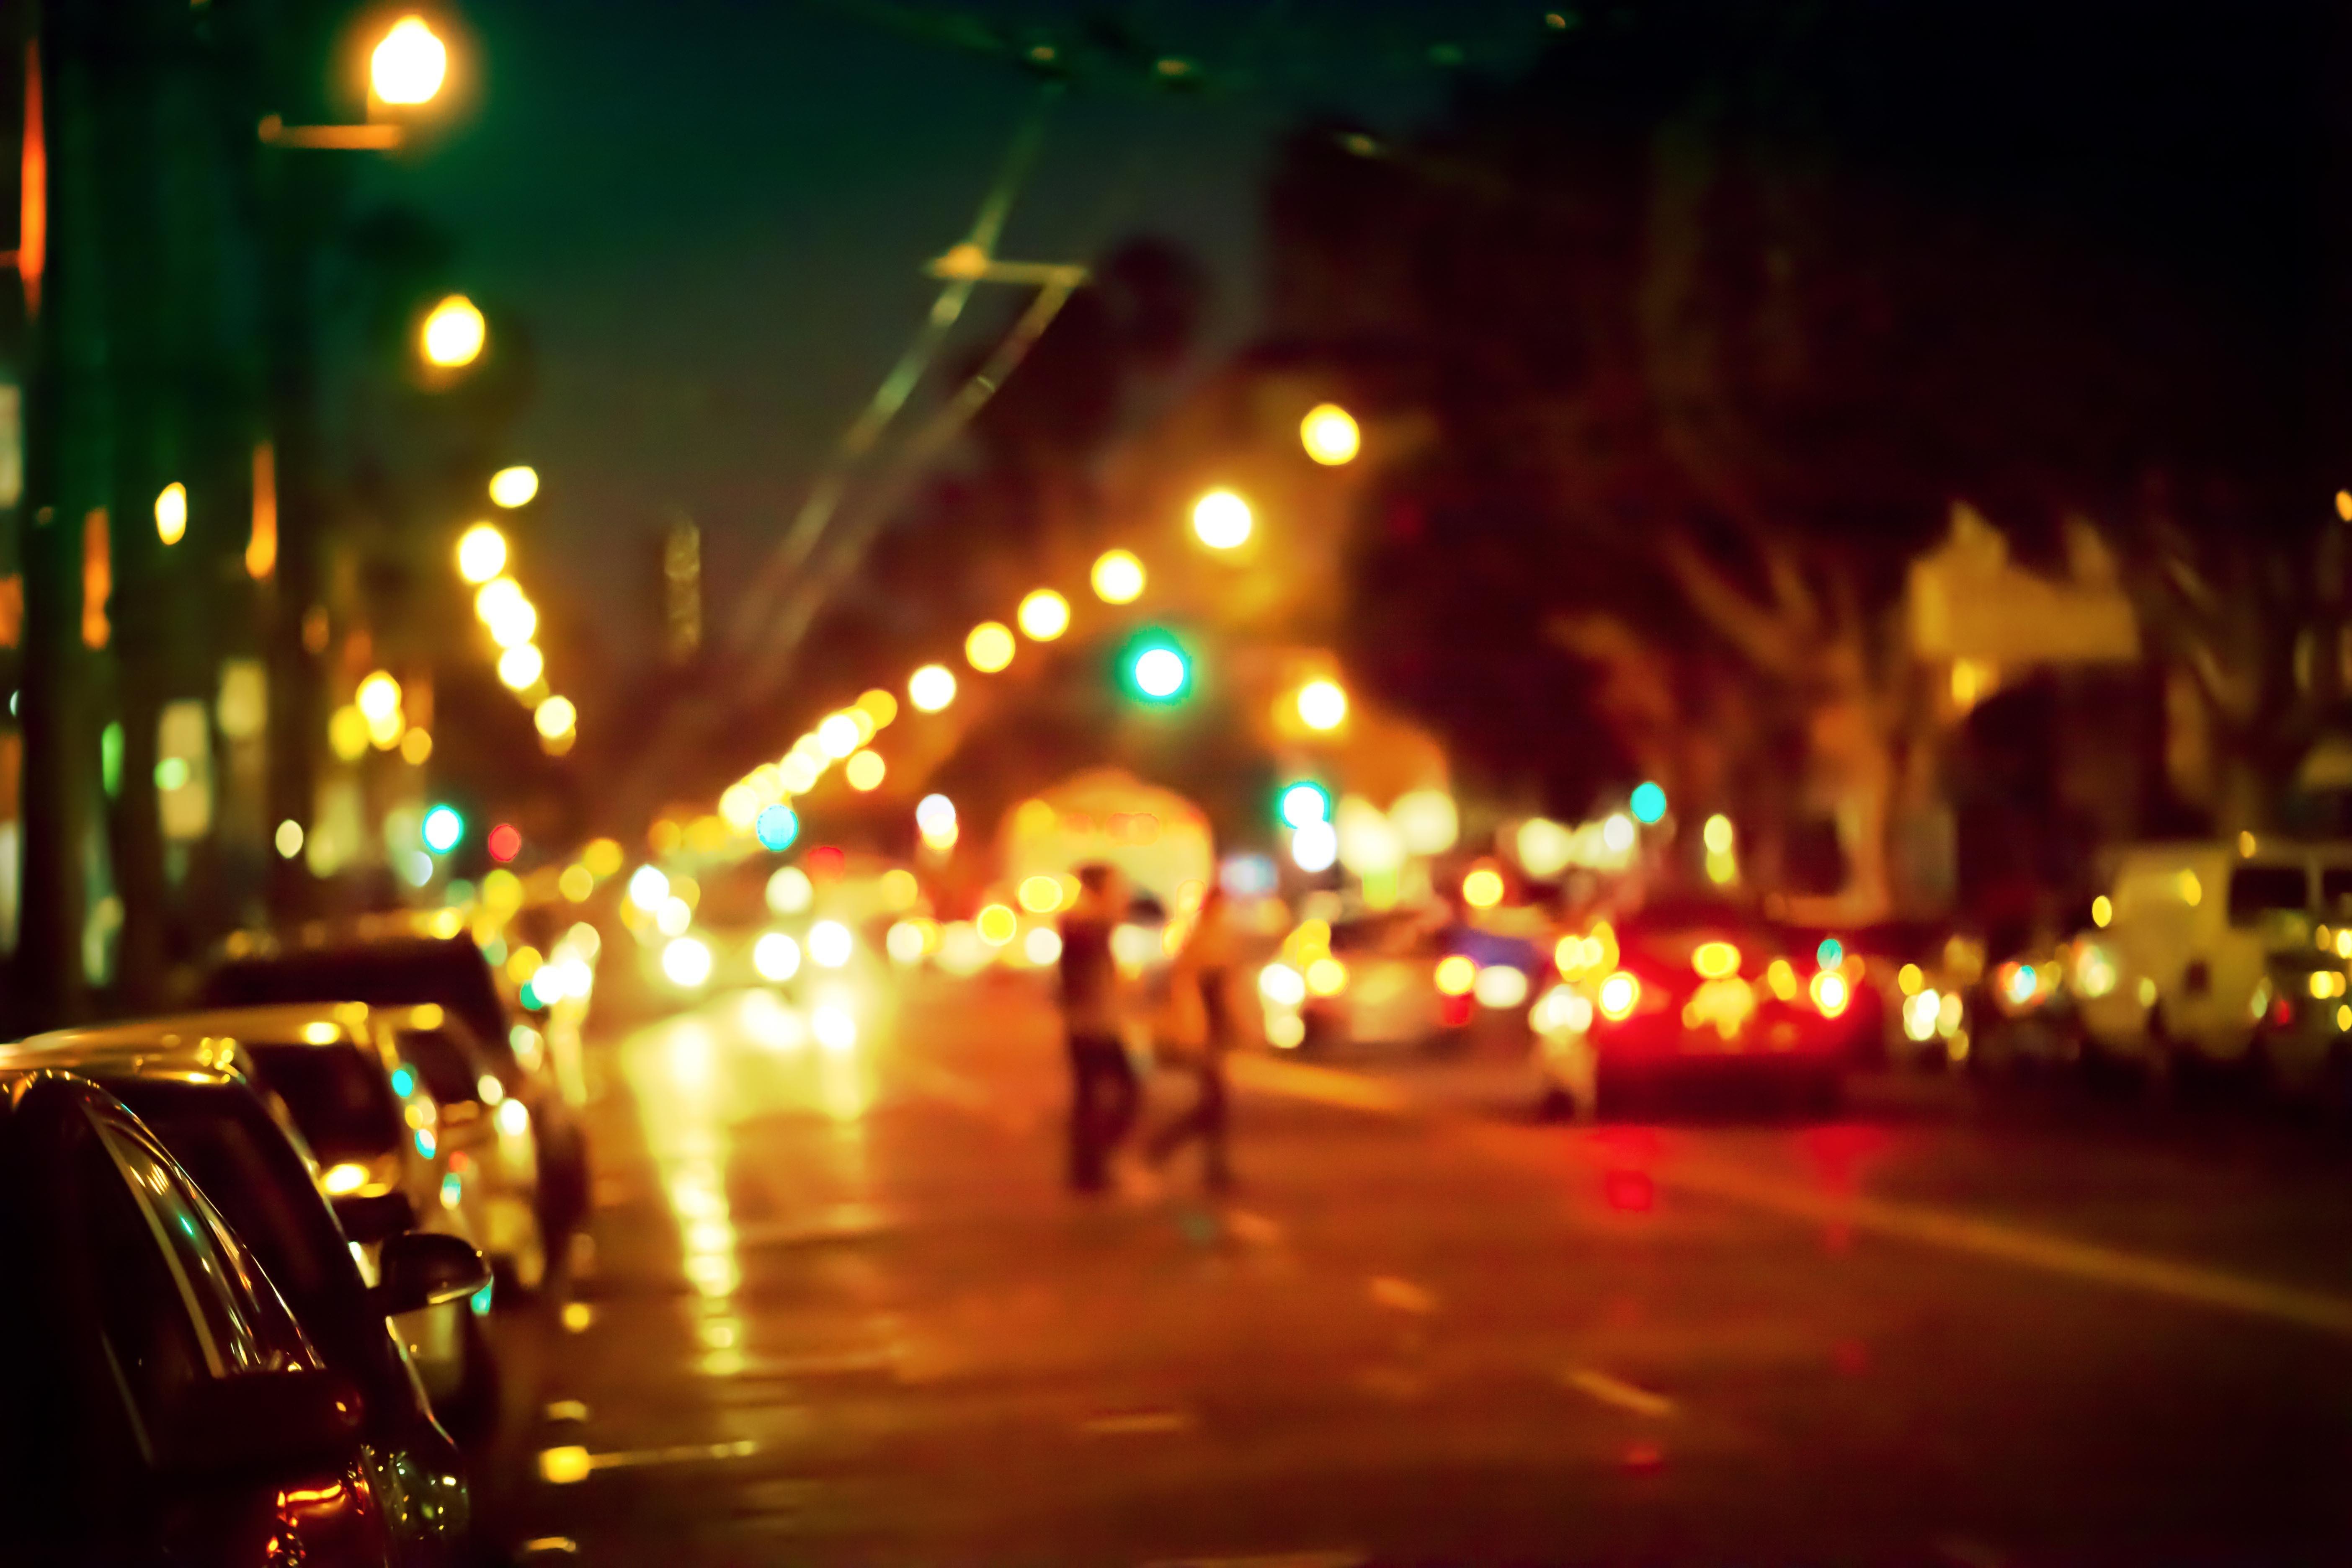 City Night Urban Road Evening Bokeh City Lights Christmas Lights Light  Lighting Darkness Crowd